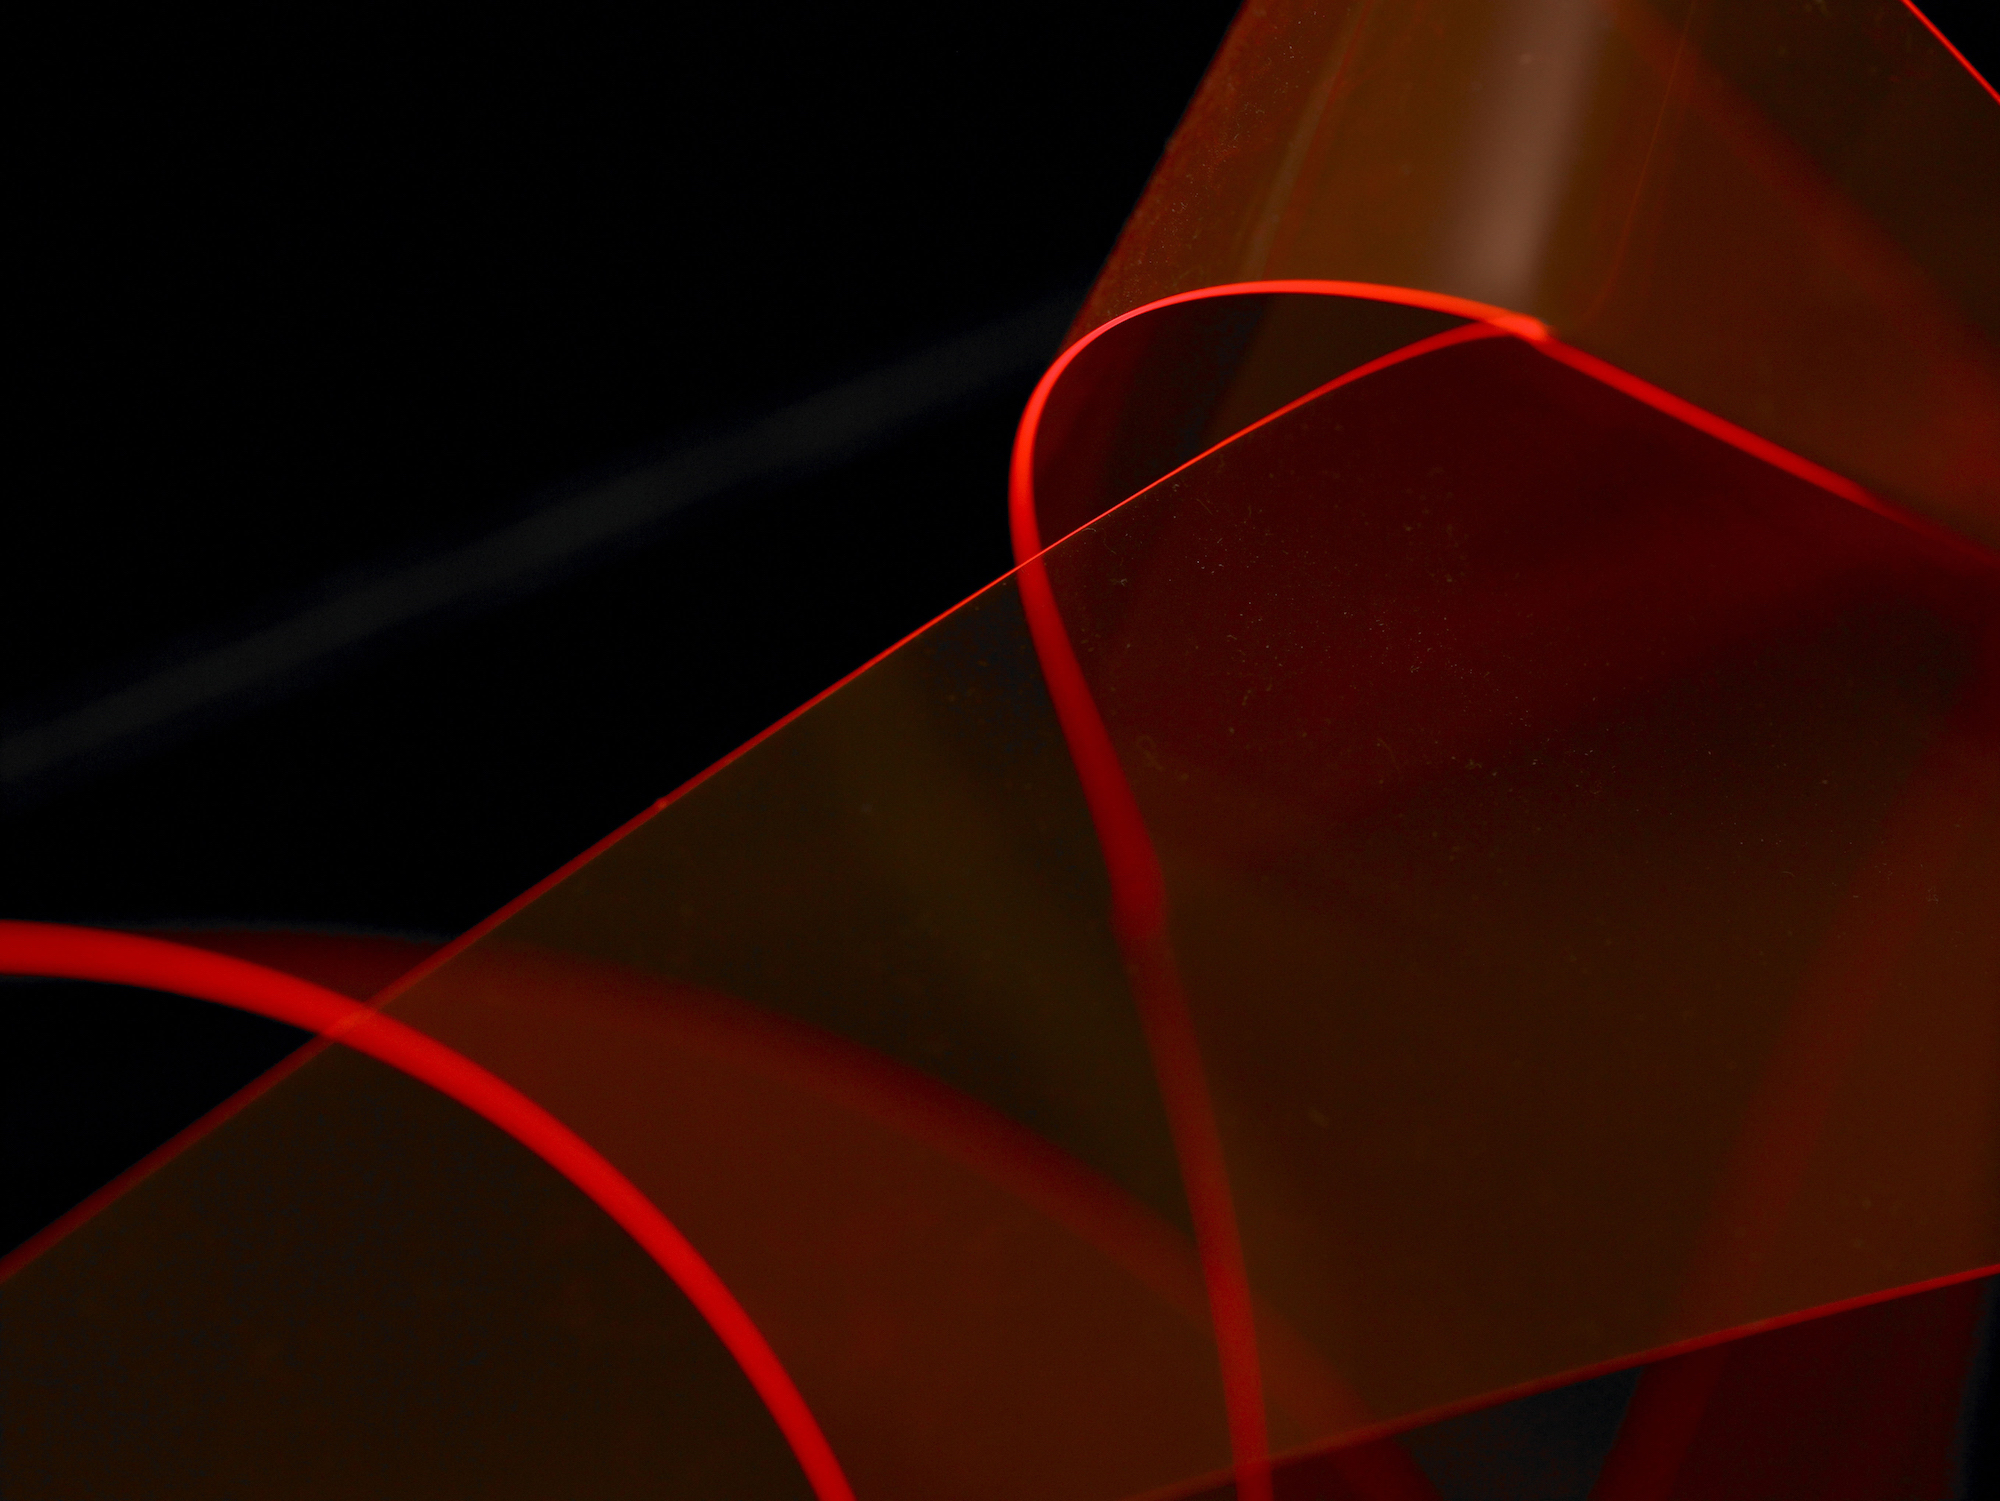 eleanor-bell-light-artist-balancing-contrast-equilibrium.jpg